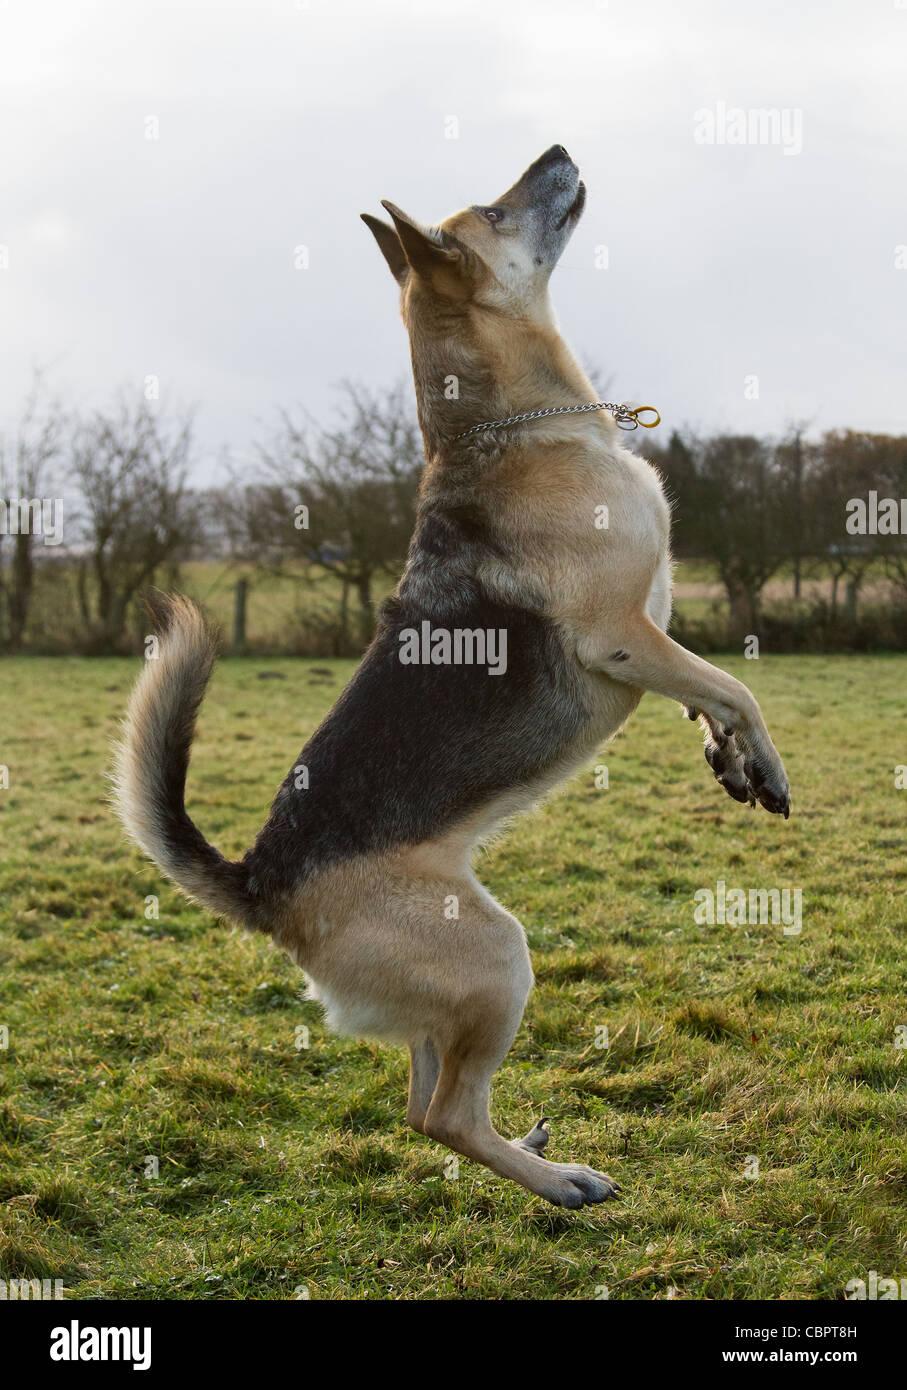 Alsatian German Shepherd Dog leaping in the air - Stock Image